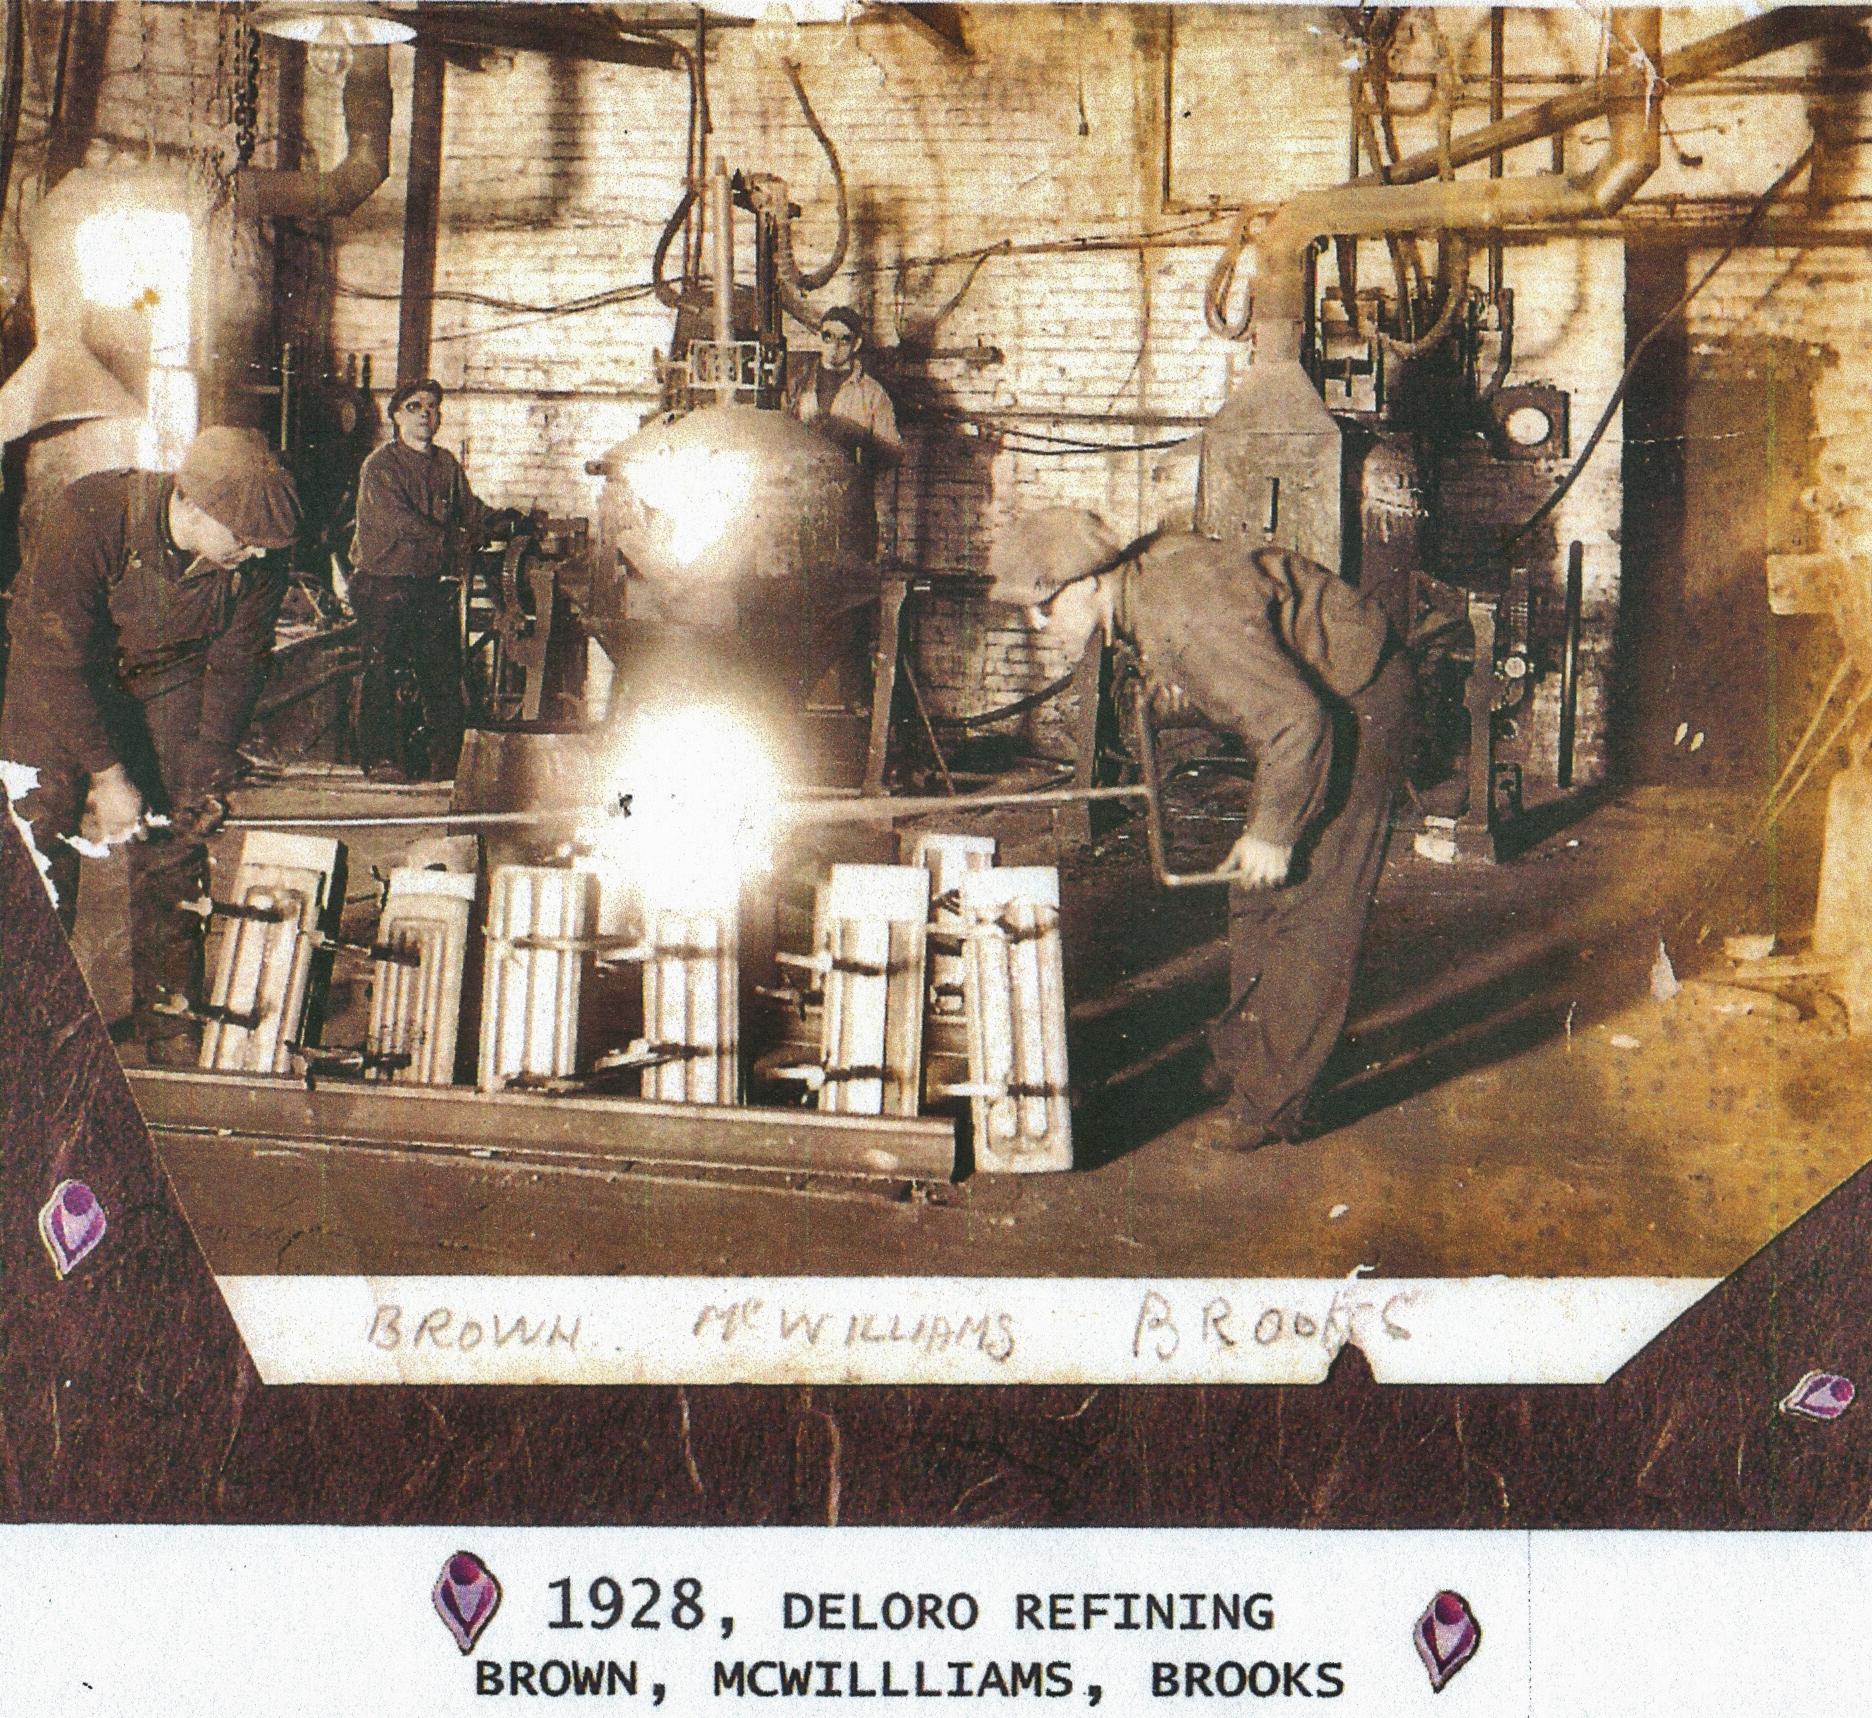 1928 Deloro refining, Brown, McWilliams, Brooks (2).jpg